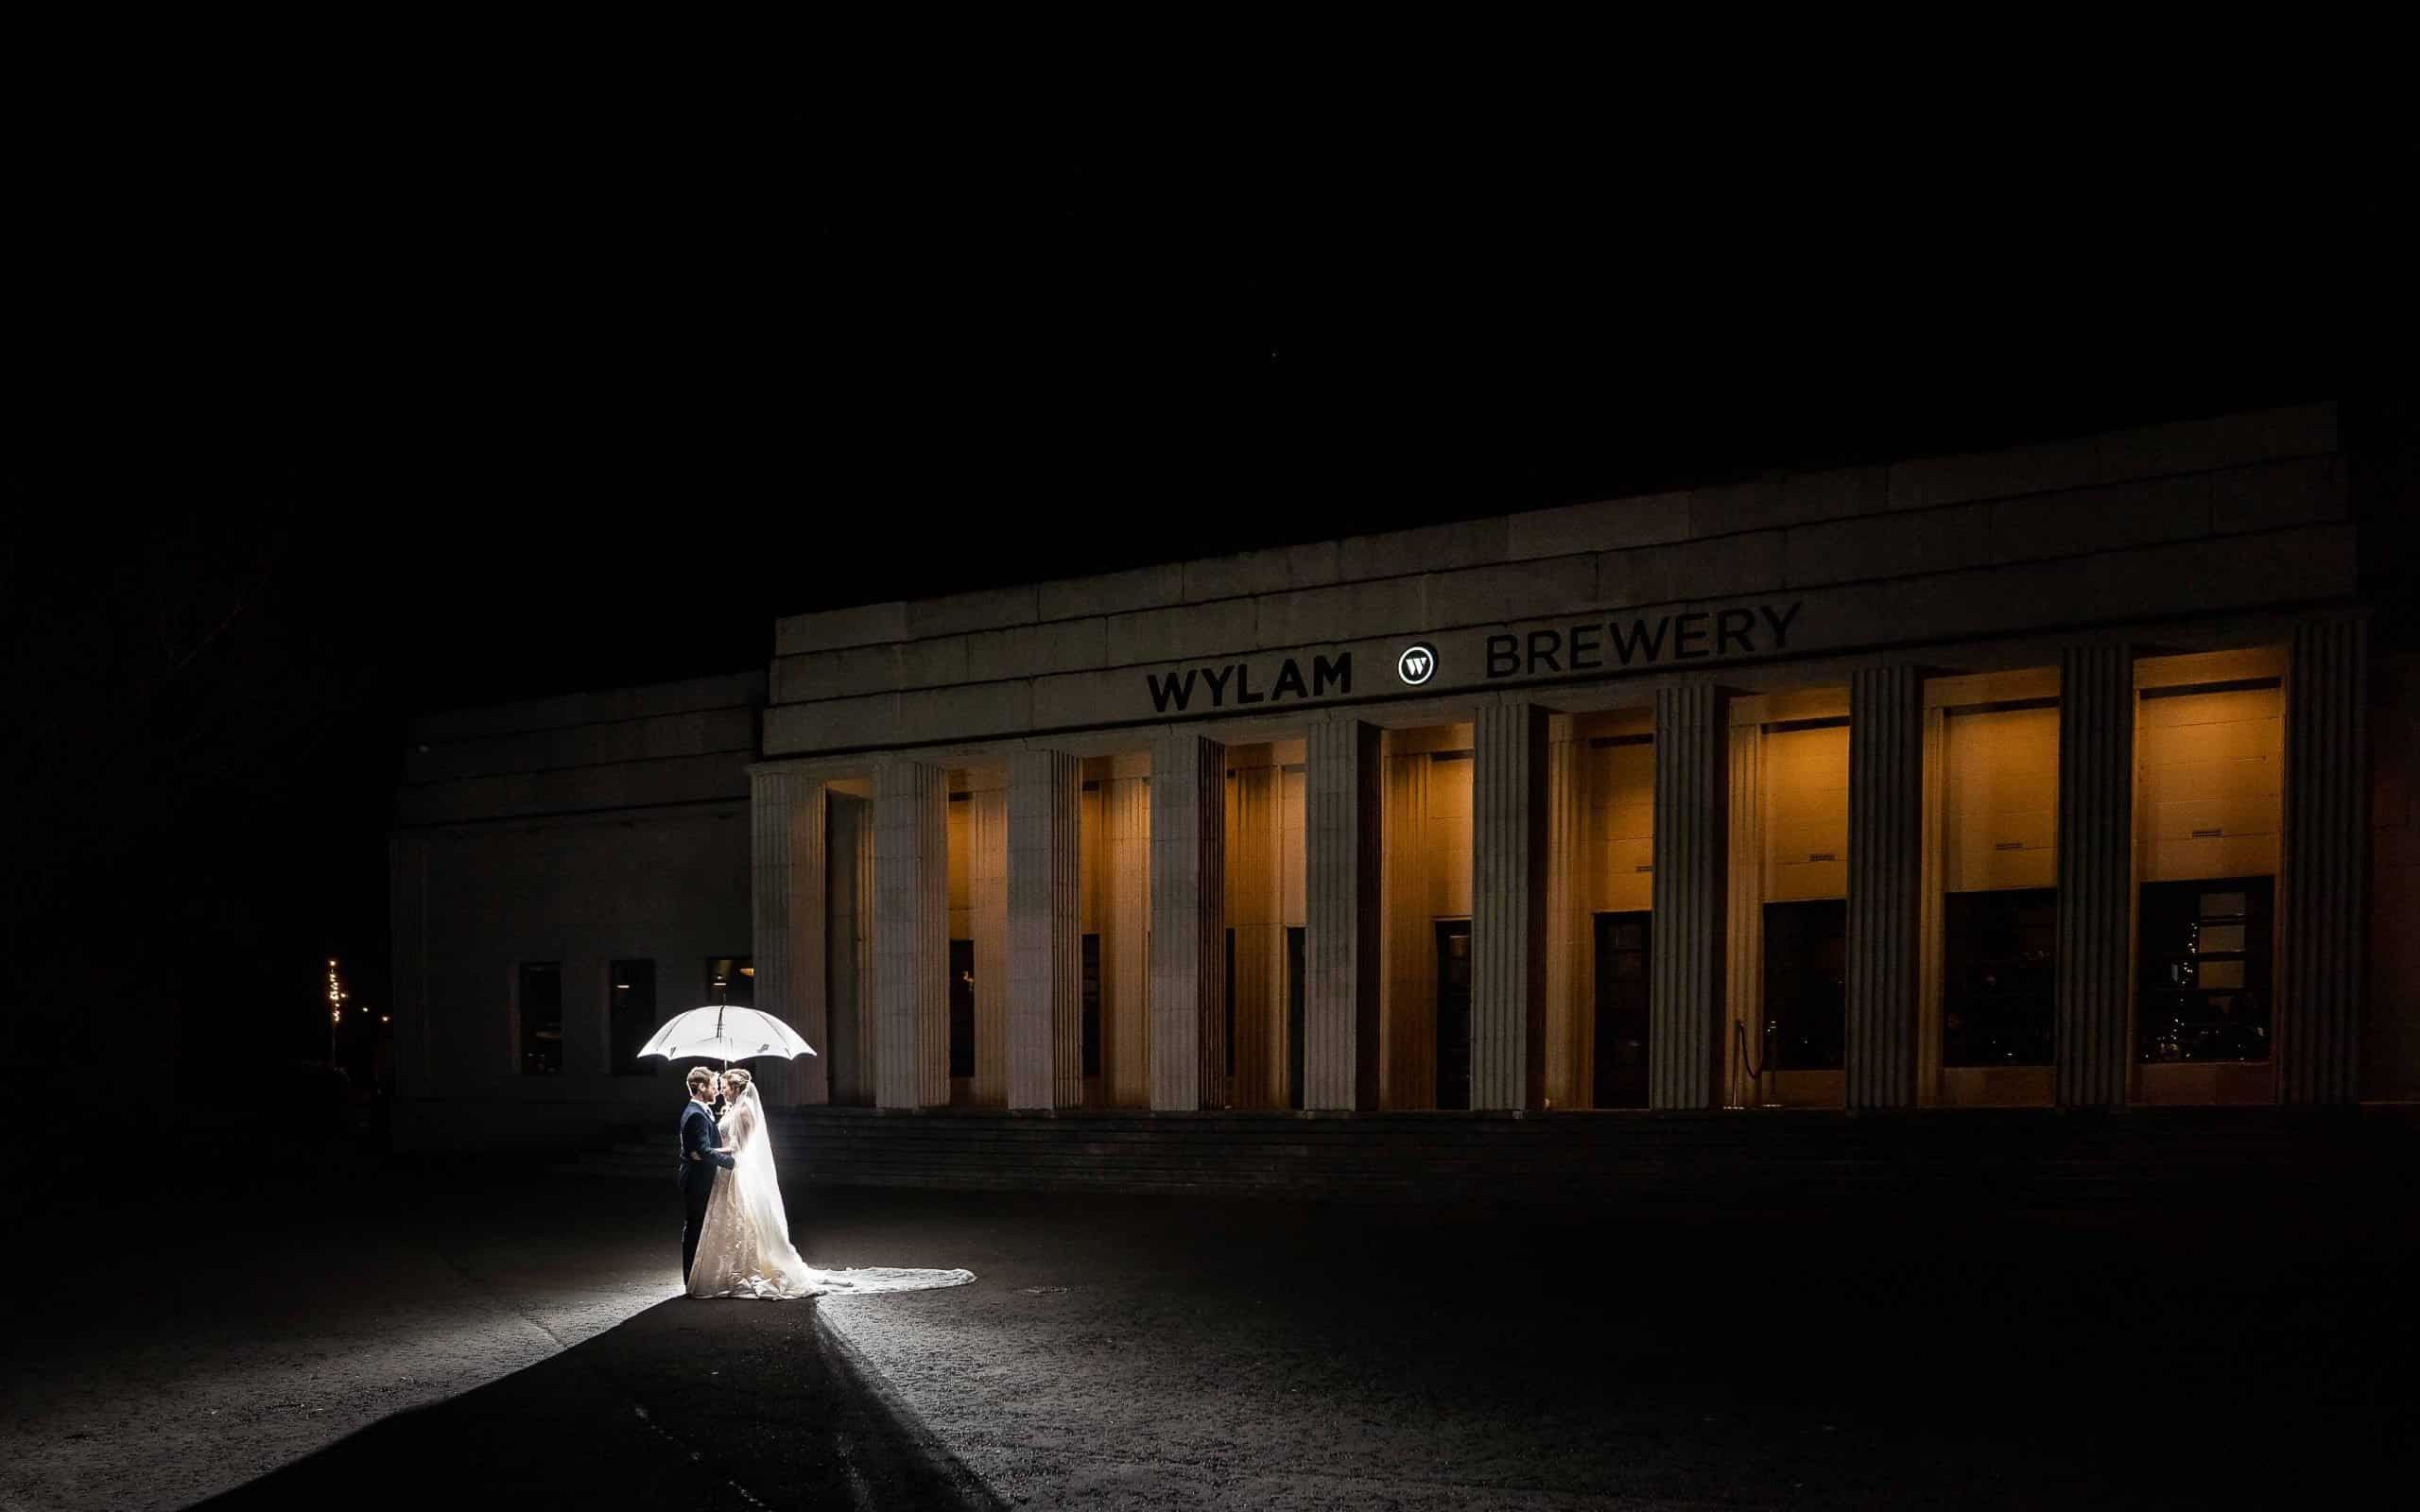 Night time wedding photo at Wylam Brewery